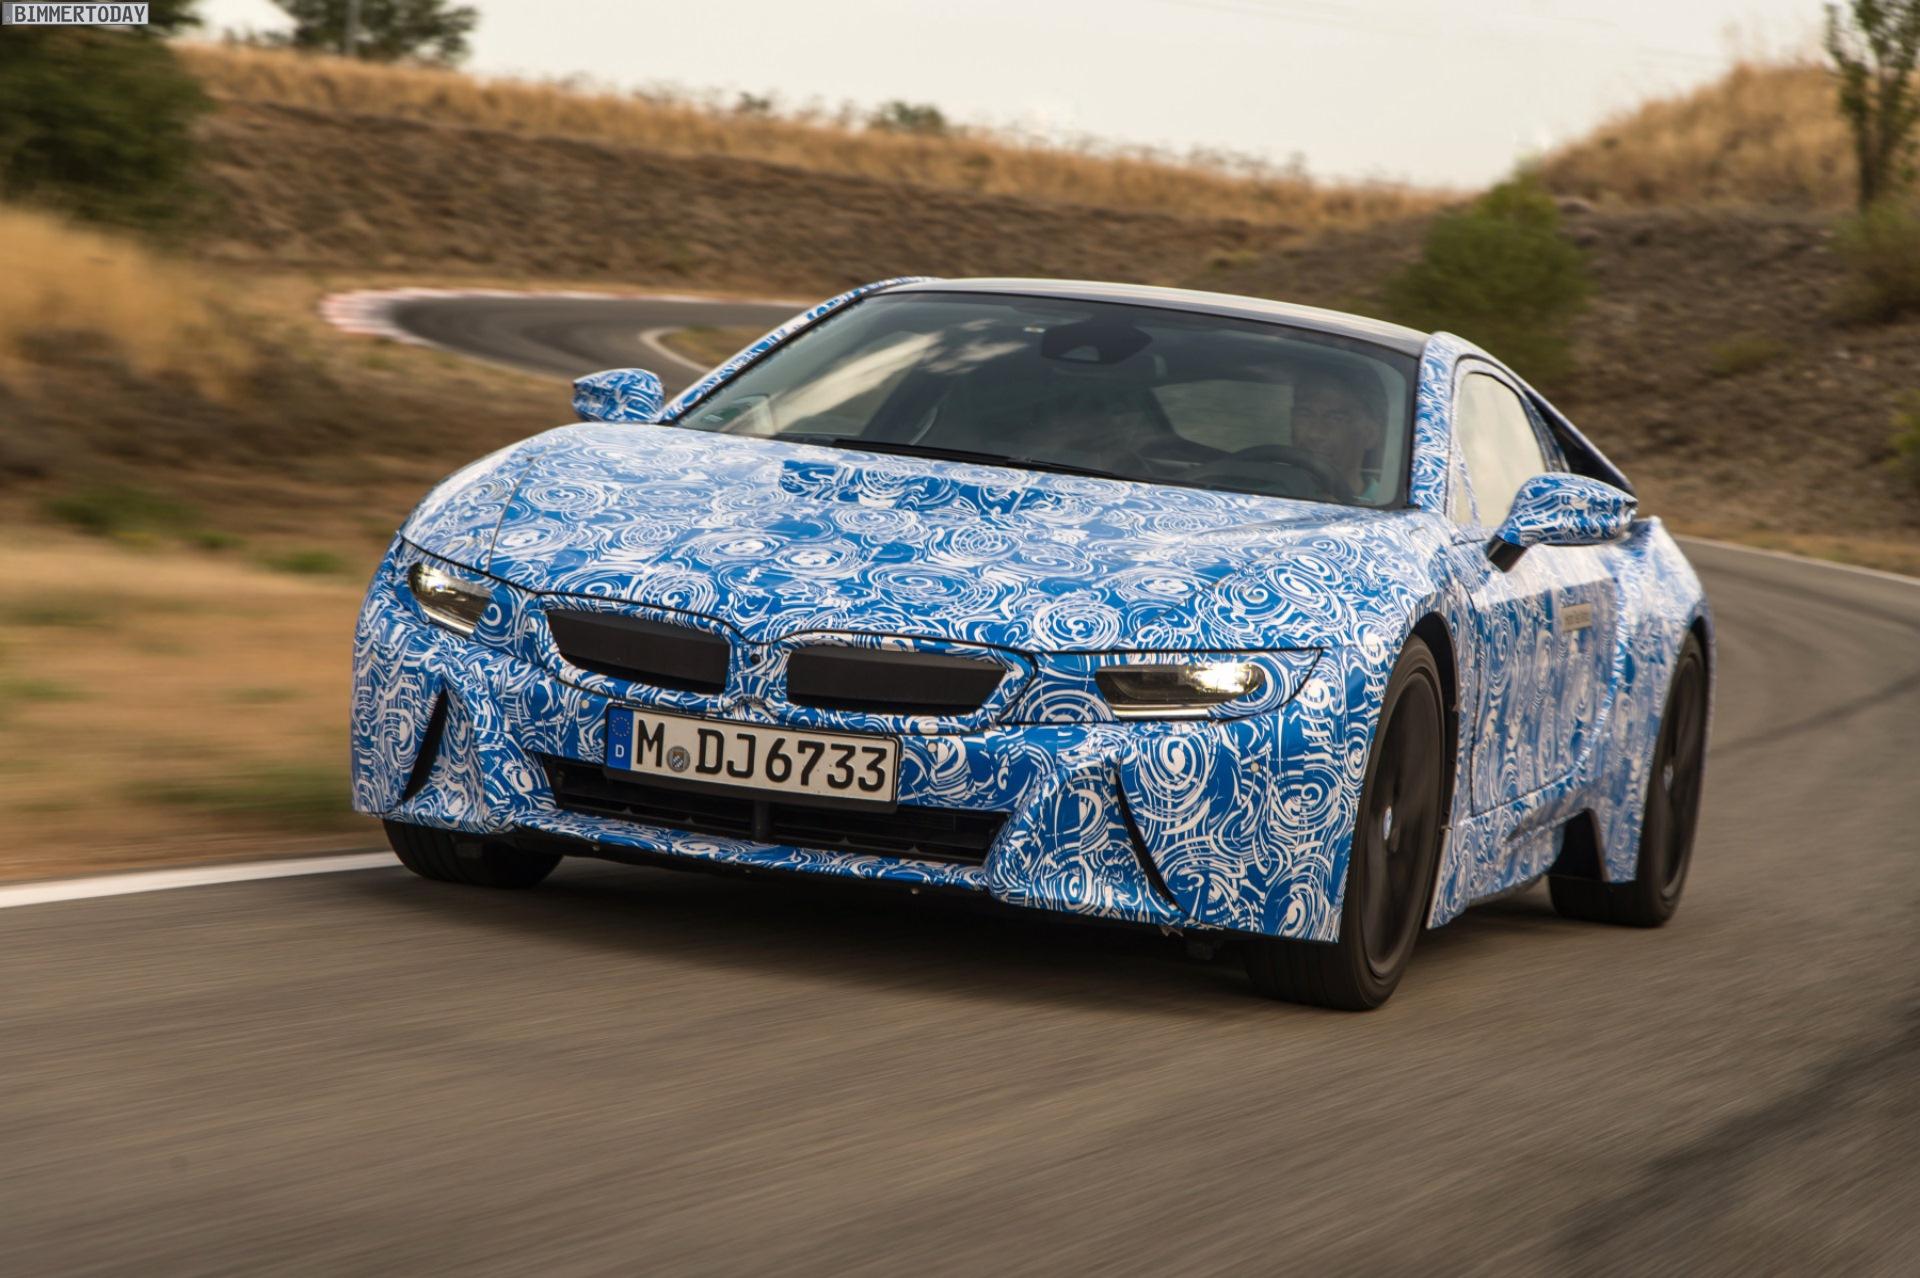 2014-BMW-i8-Plug-in-Hybrid-Sportwagen-02